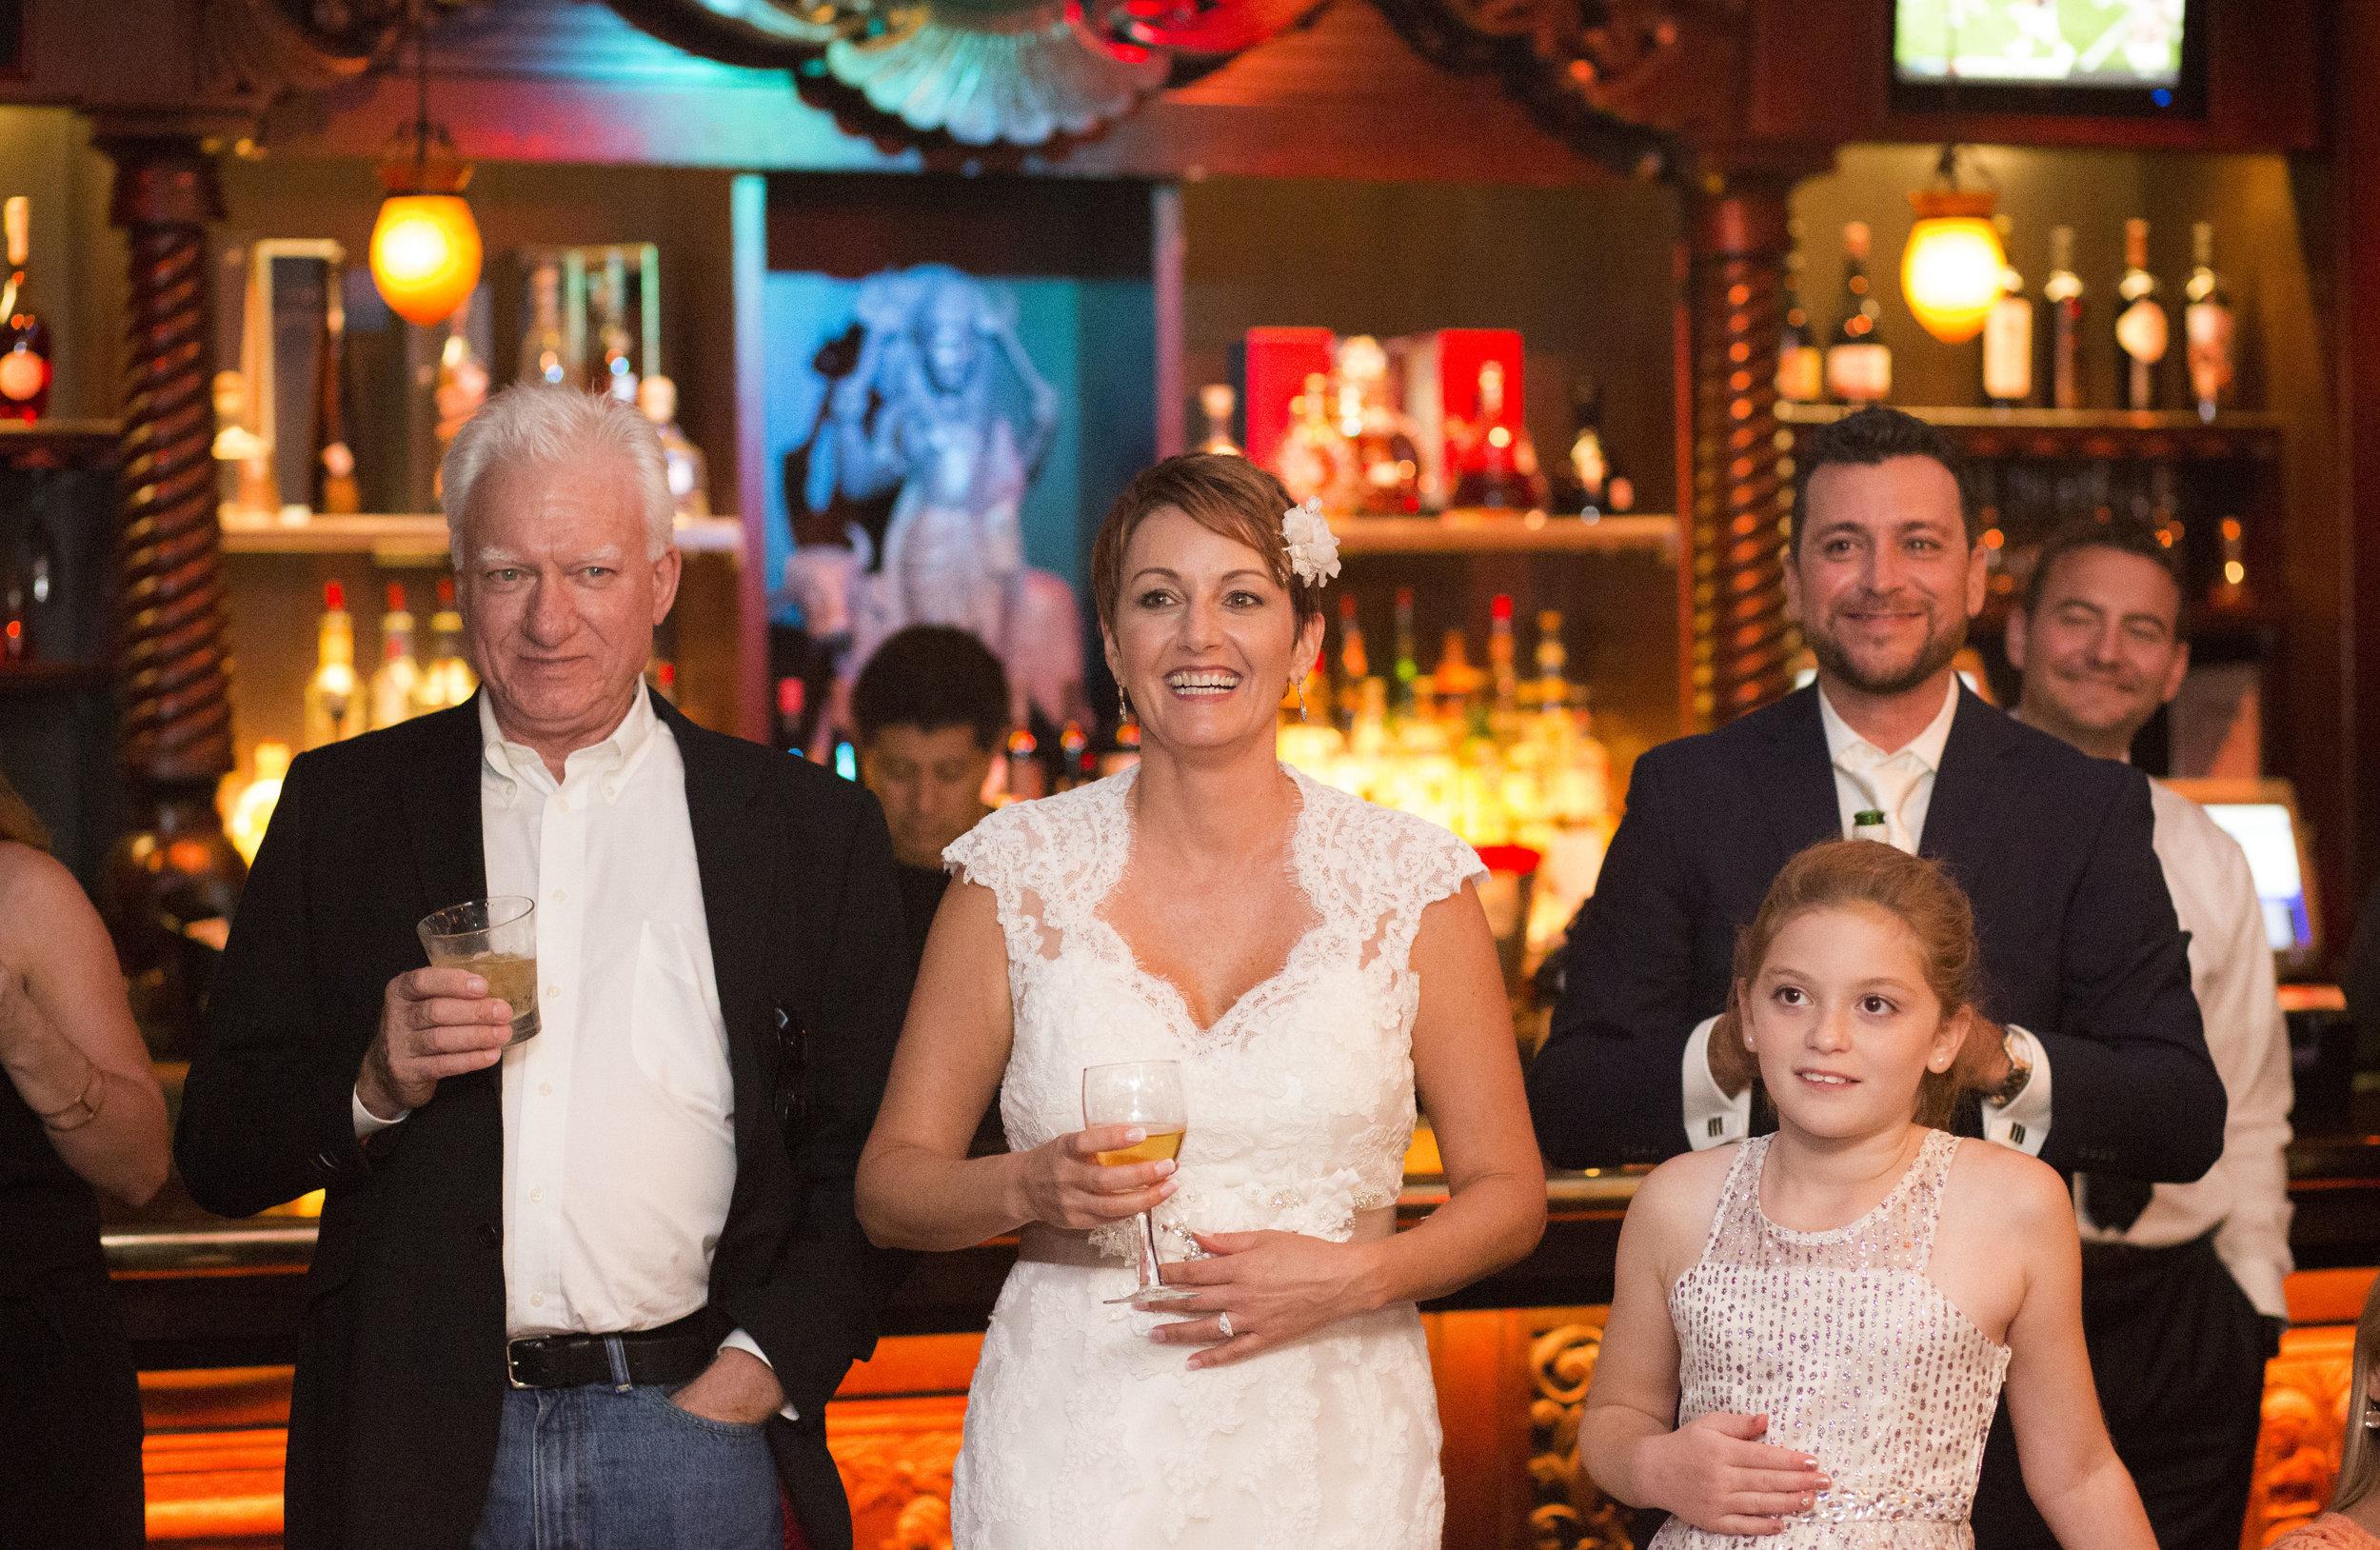 ATGI_Kat and Gabe Wedding 2016_2S8A5793.jpg